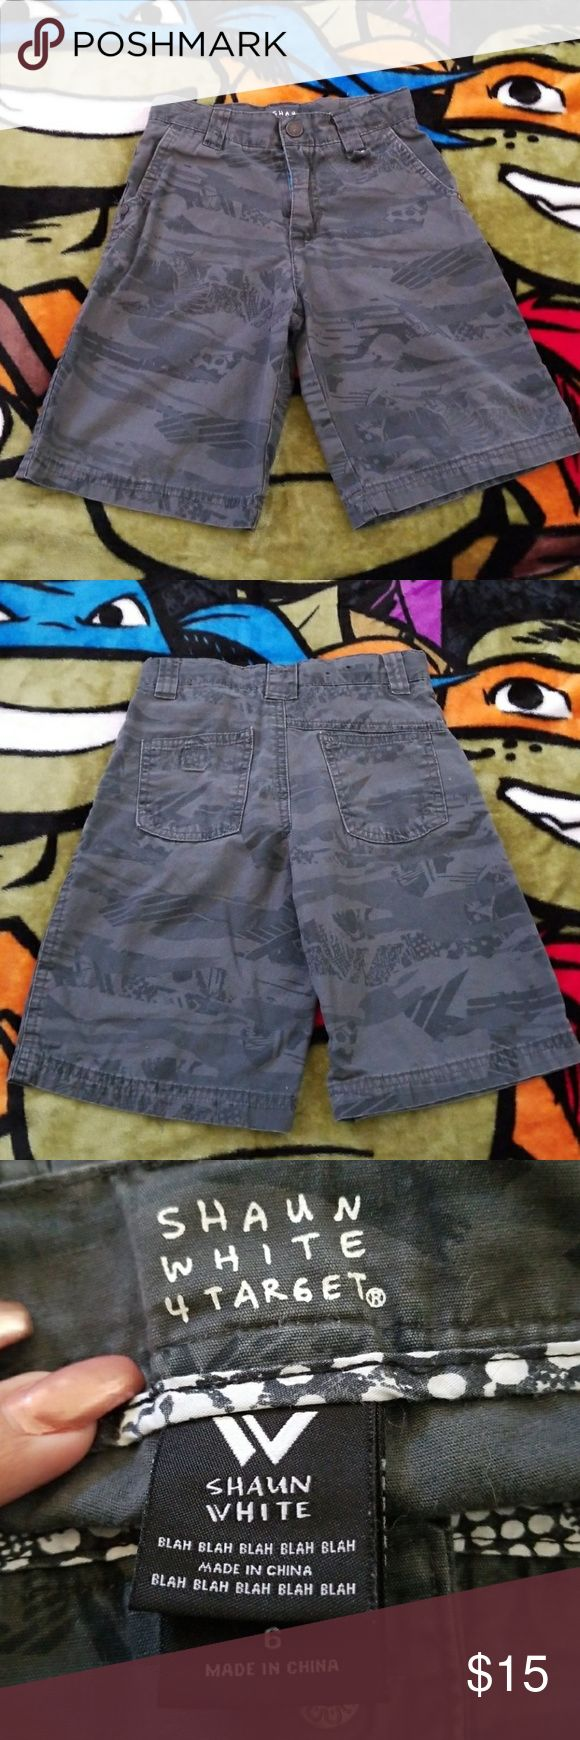 Boys size 6 Shaun White grey design pattern shorts Boys Size 6 #Shaunwhite #grey #pattern #design #shorts with adjustable waist. #adjustablewaist Used but in excellent condition. Shaun White Bottoms Shorts